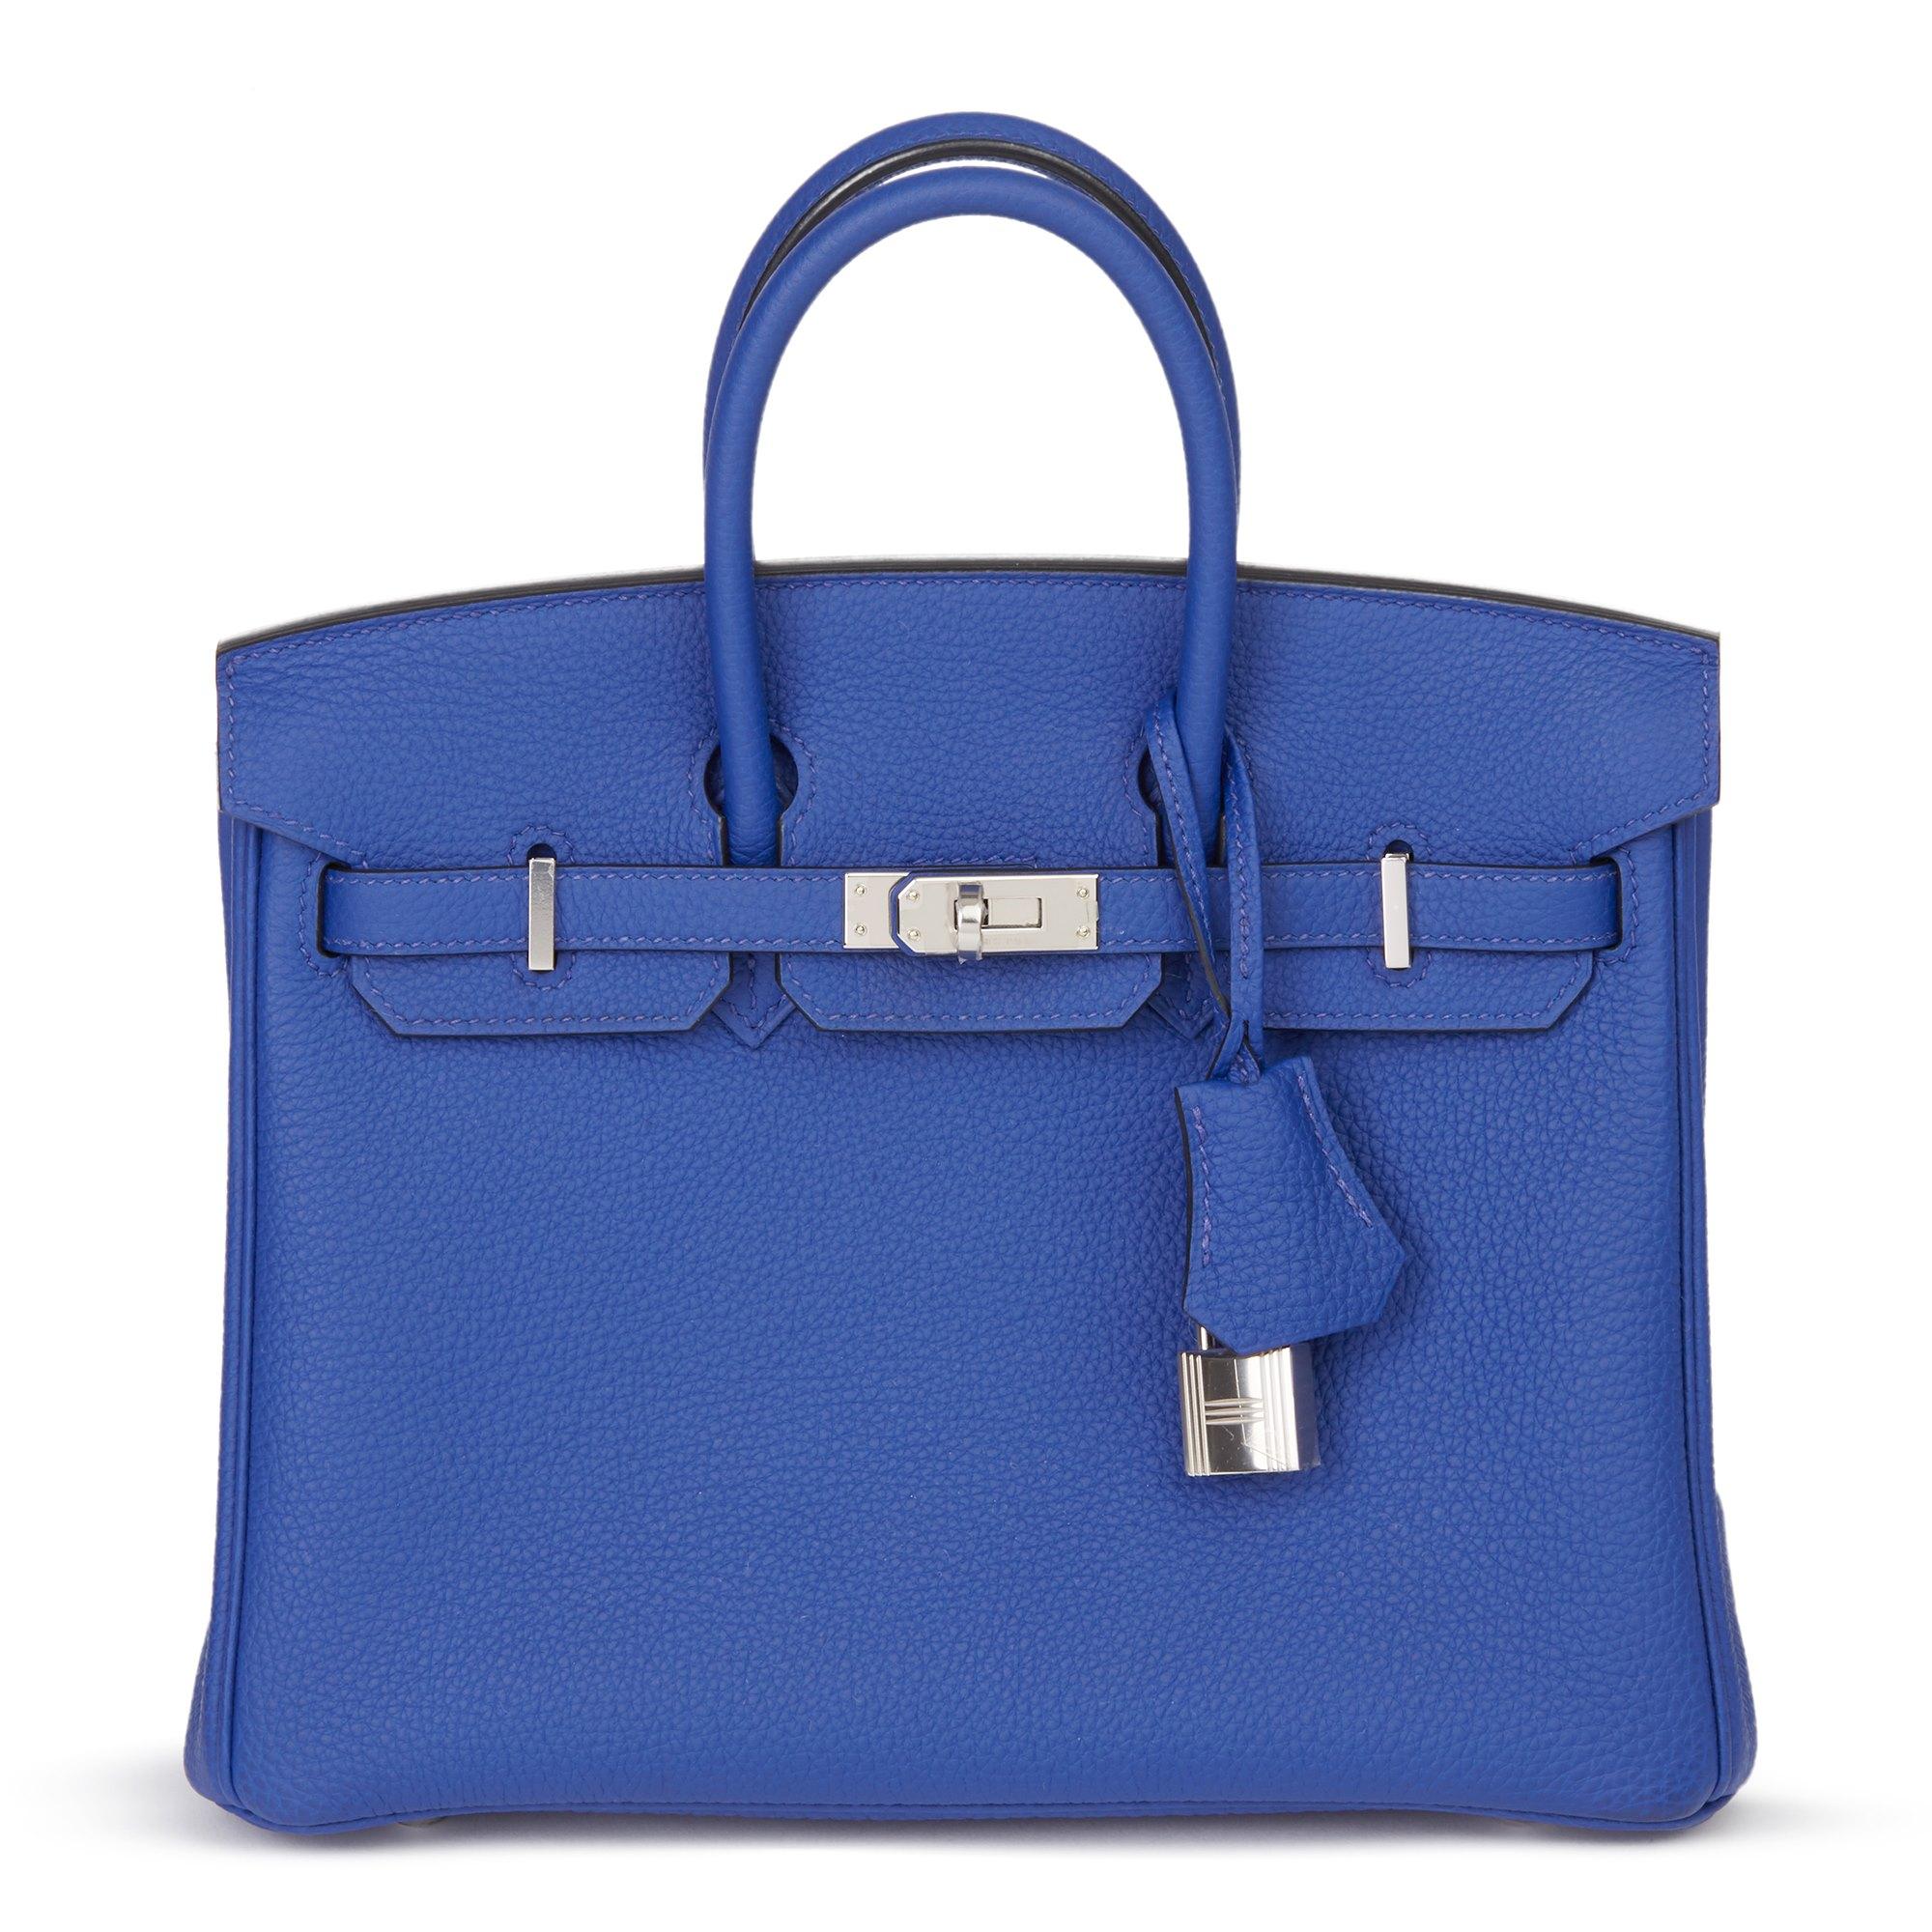 Hermès Blue Electric Togo Leather Birkin 25cm